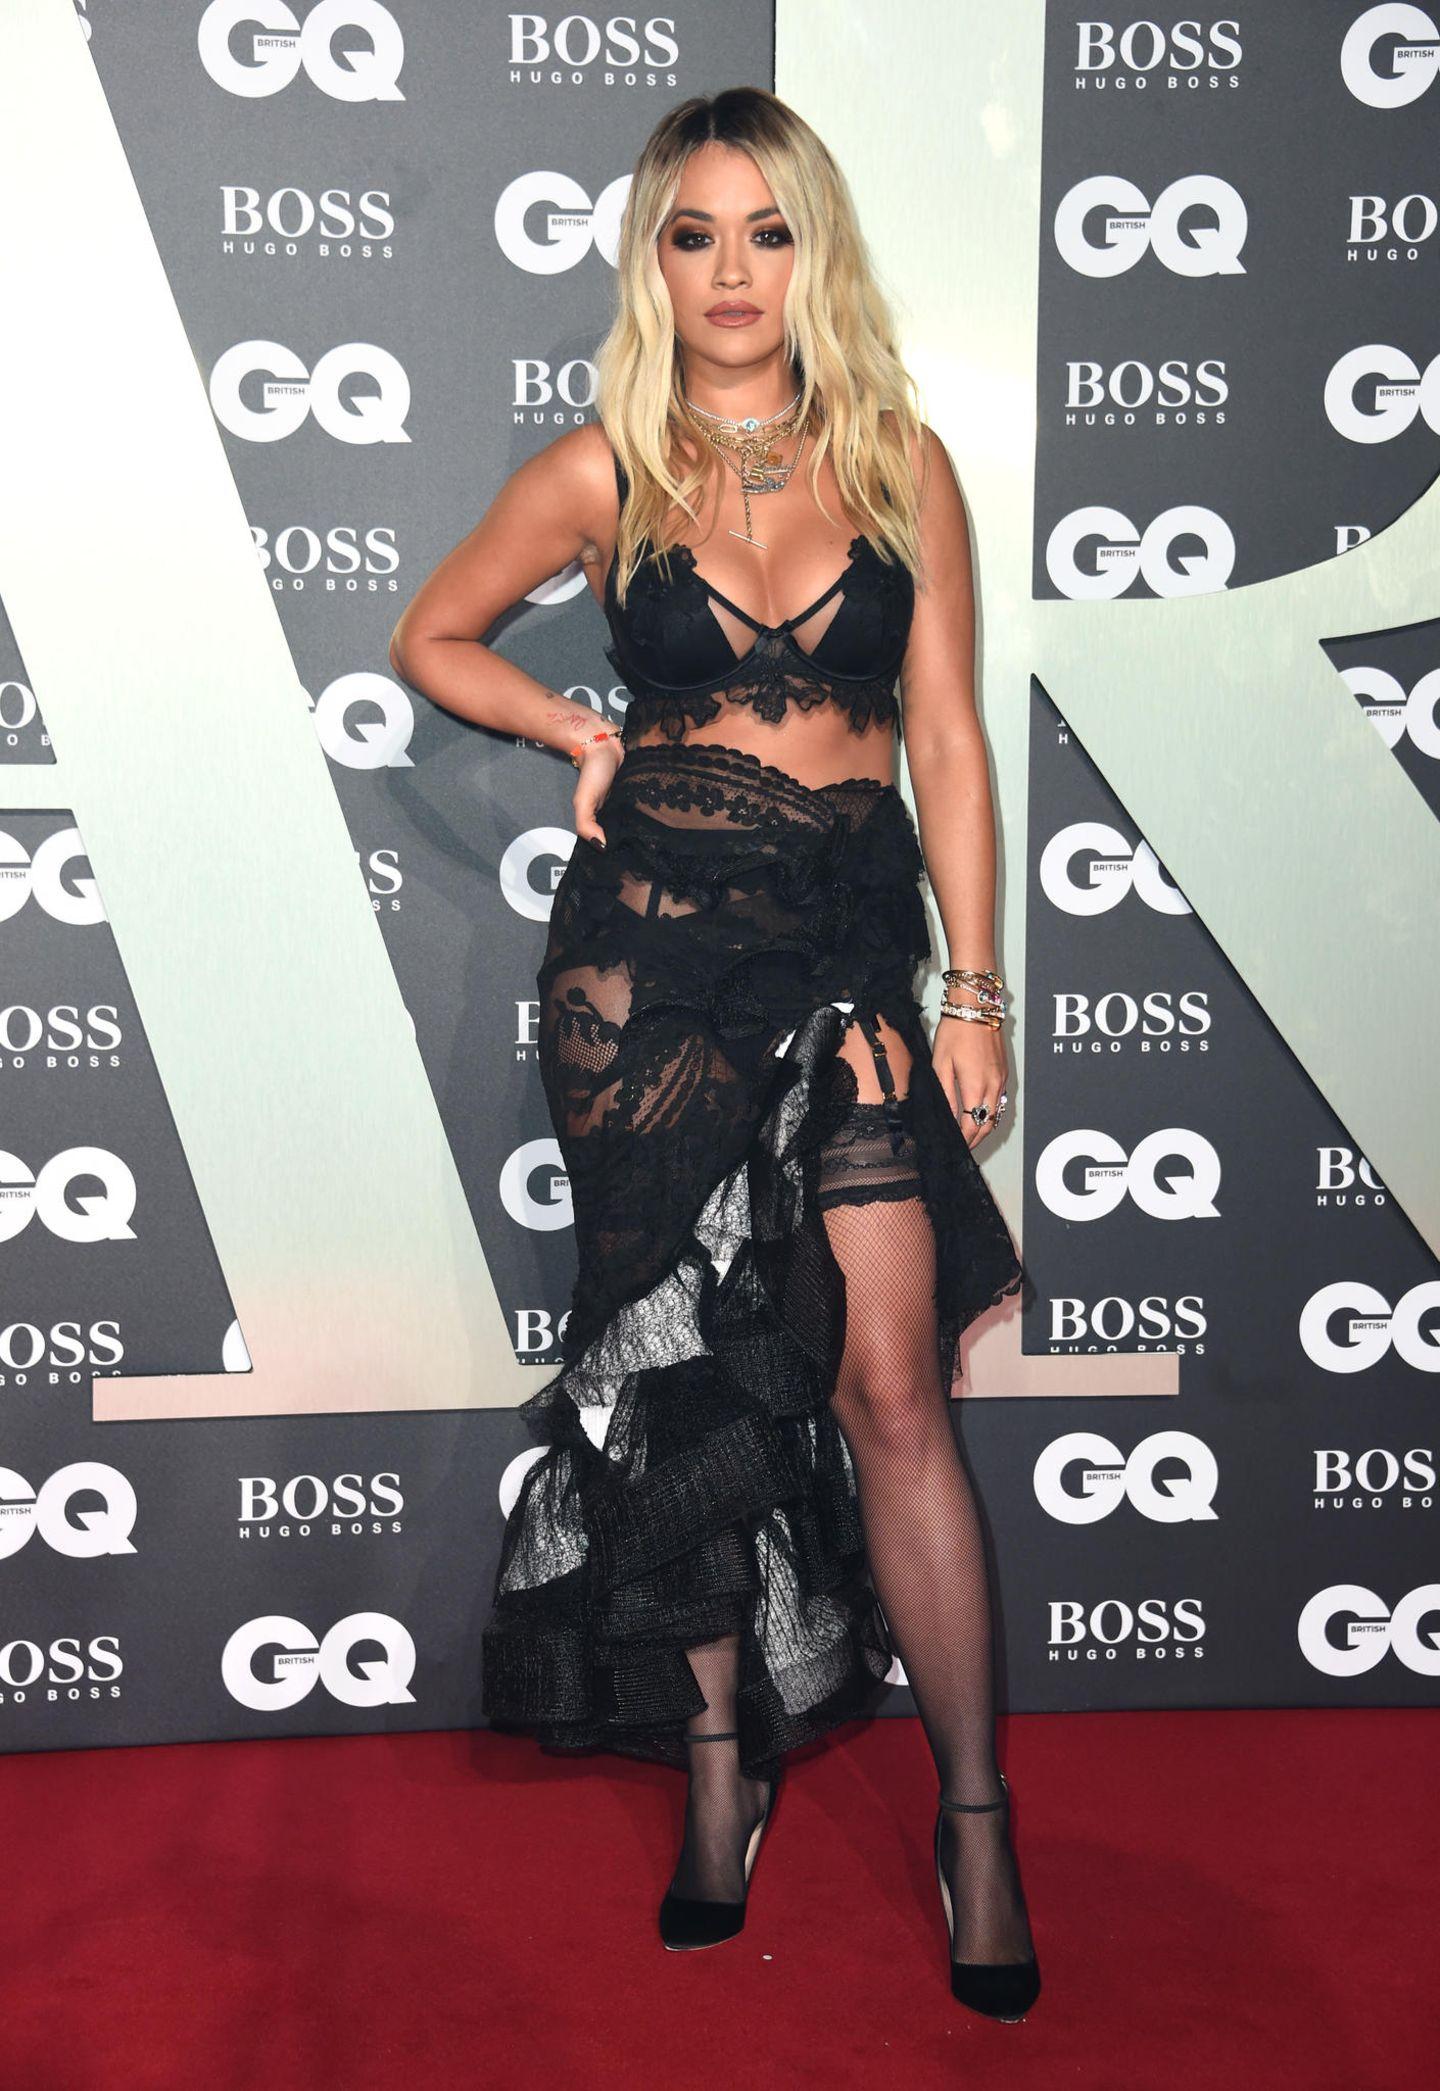 GQ Awards 2019